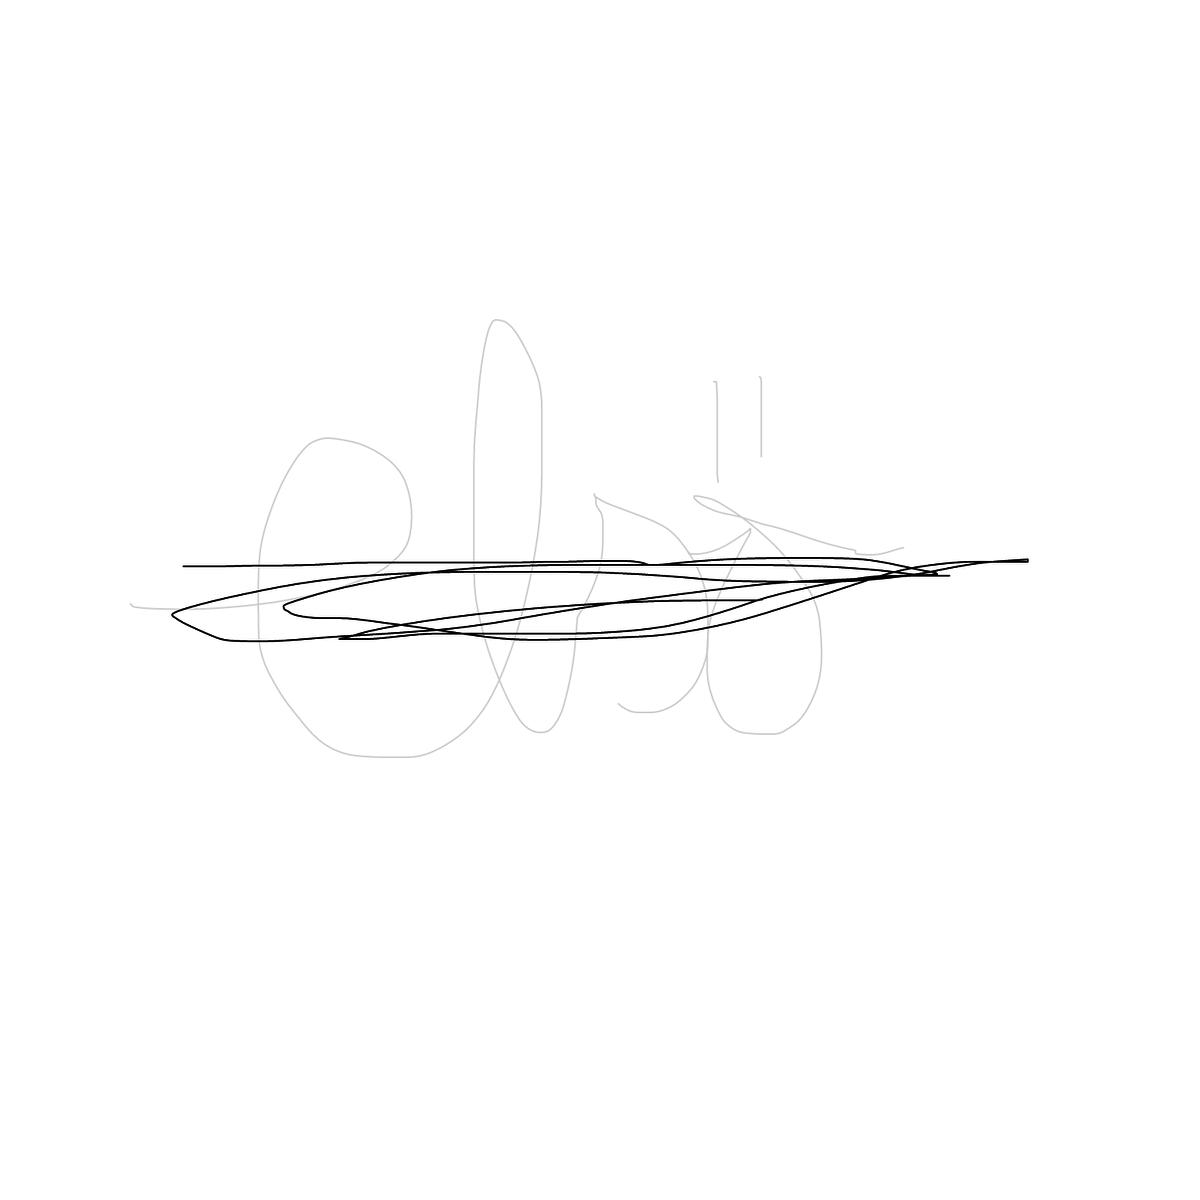 BAAAM drawing#7899 lat:47.4983825683593750lng: 19.0405120849609380